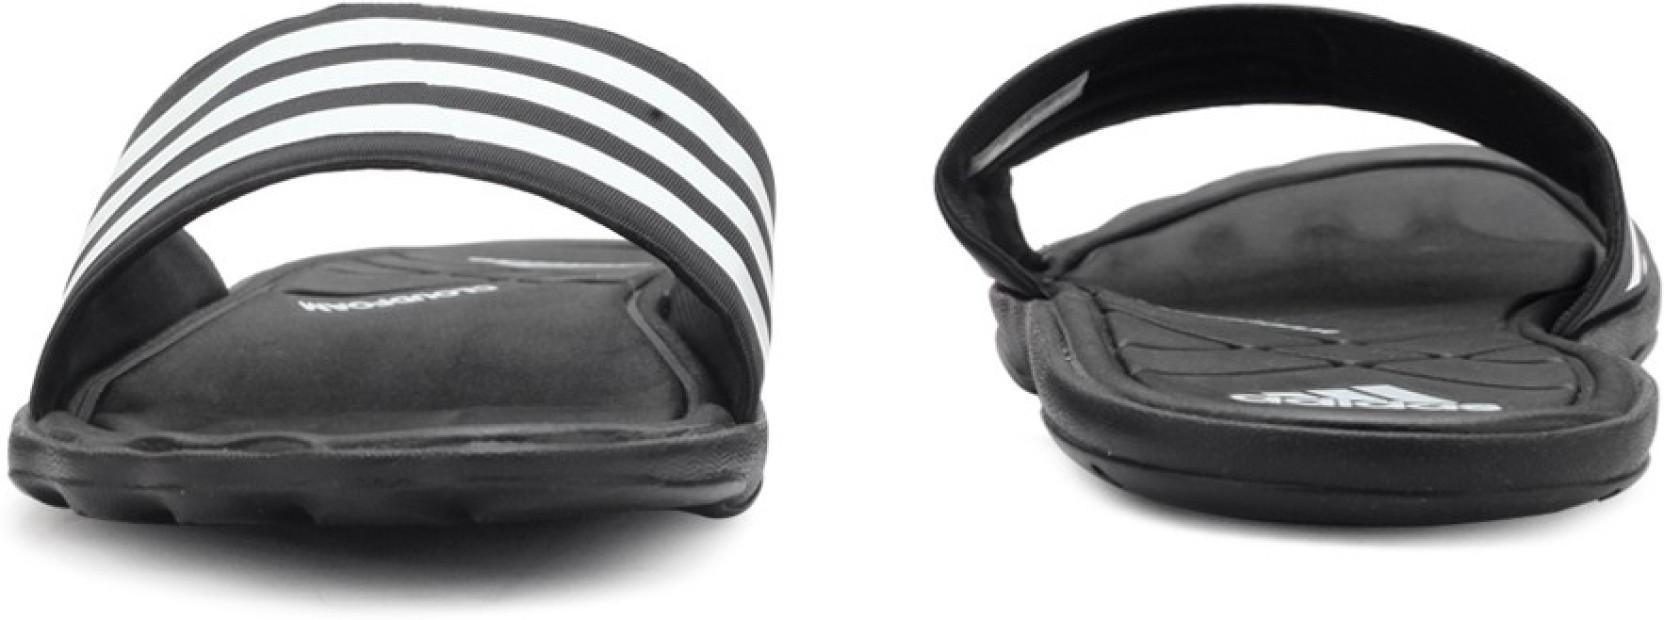 sports shoes 39075 7a430 ADIDAS ADIPURE CF Slides. Home